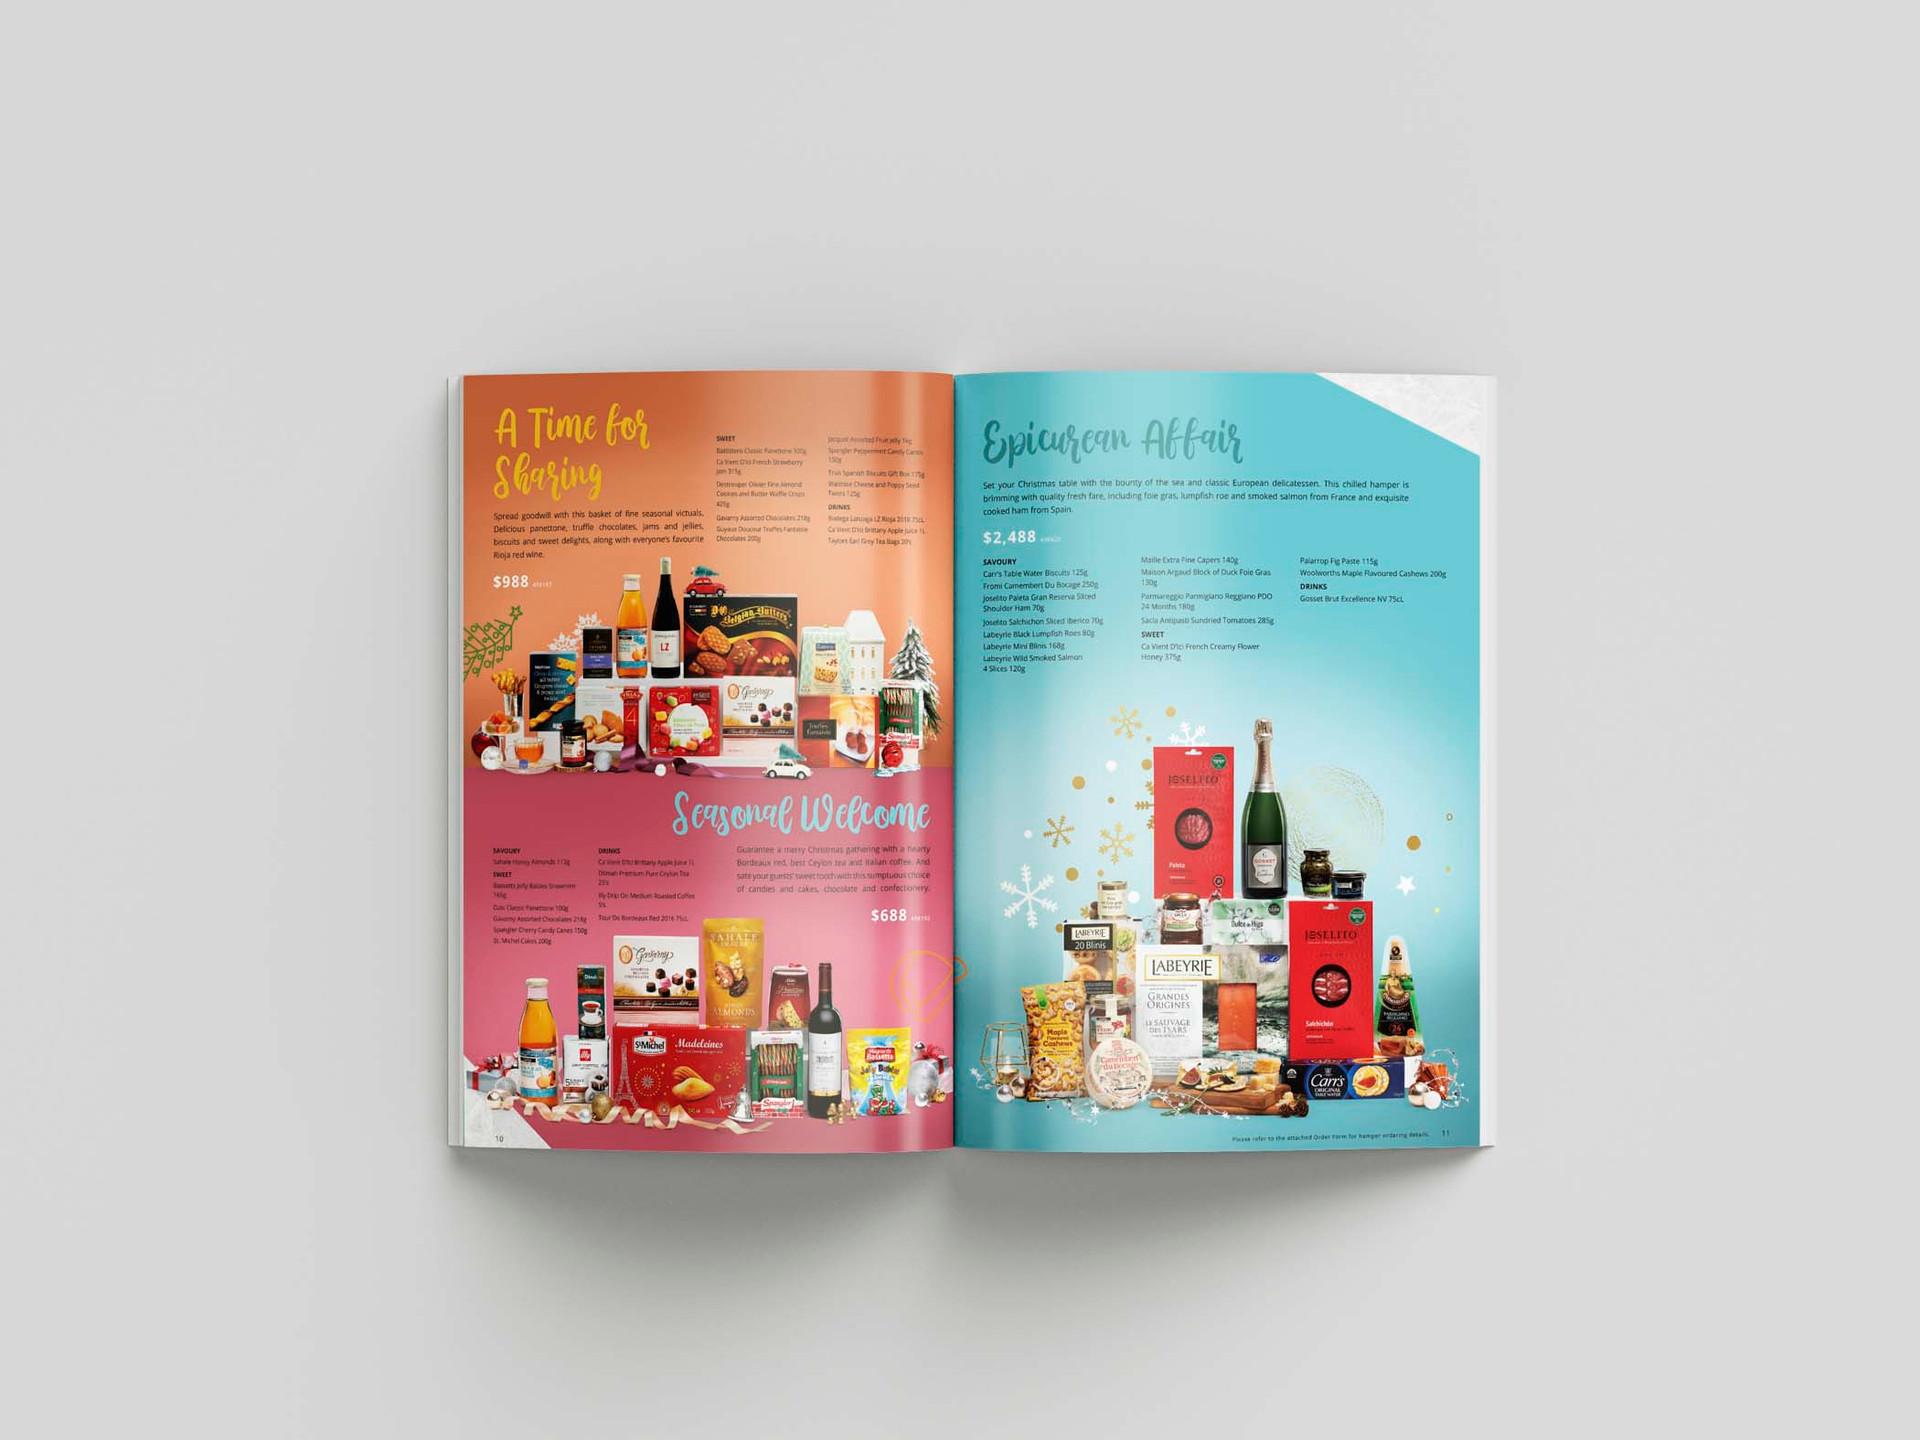 Great-Food-Hall-Catalogue-P.10-11s.jpg